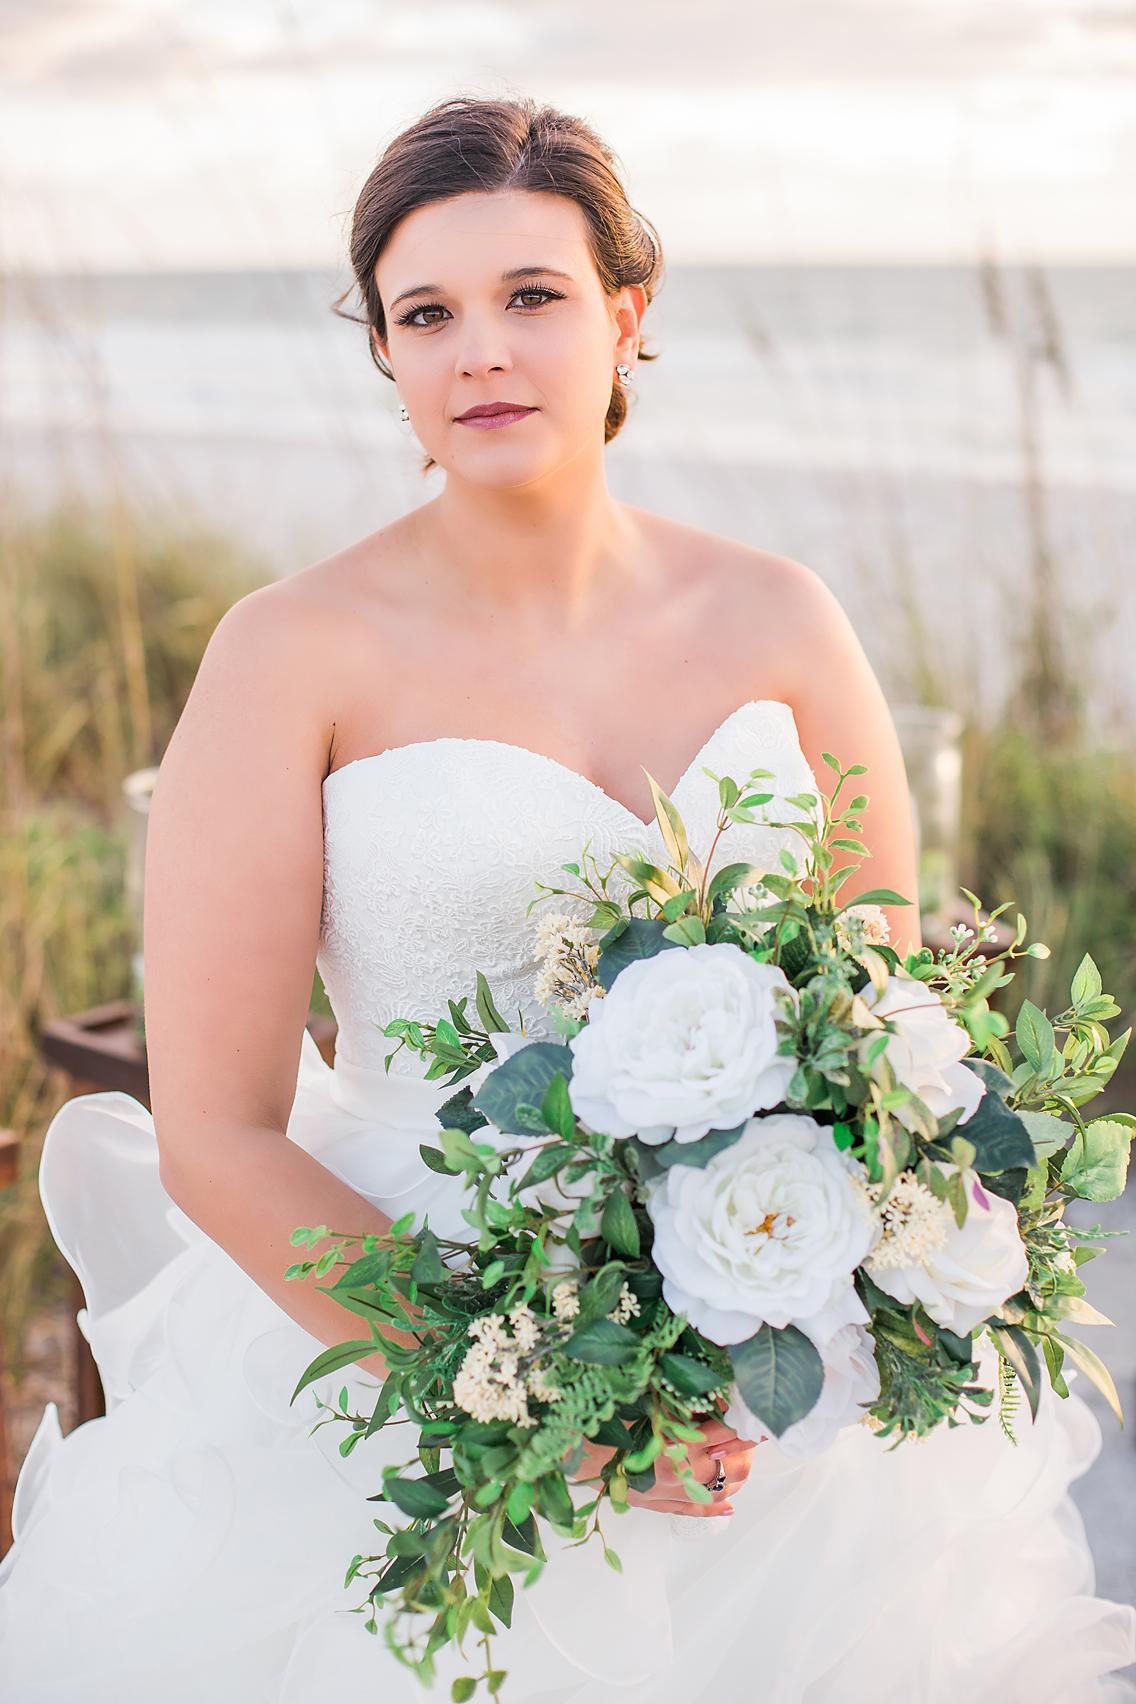 Bailey + Chalin - Anna Maria Island Wedding Photographer - Destination Wedding Photography - Emily & Co. Photography - Beach Wedding Photography 18.jpg